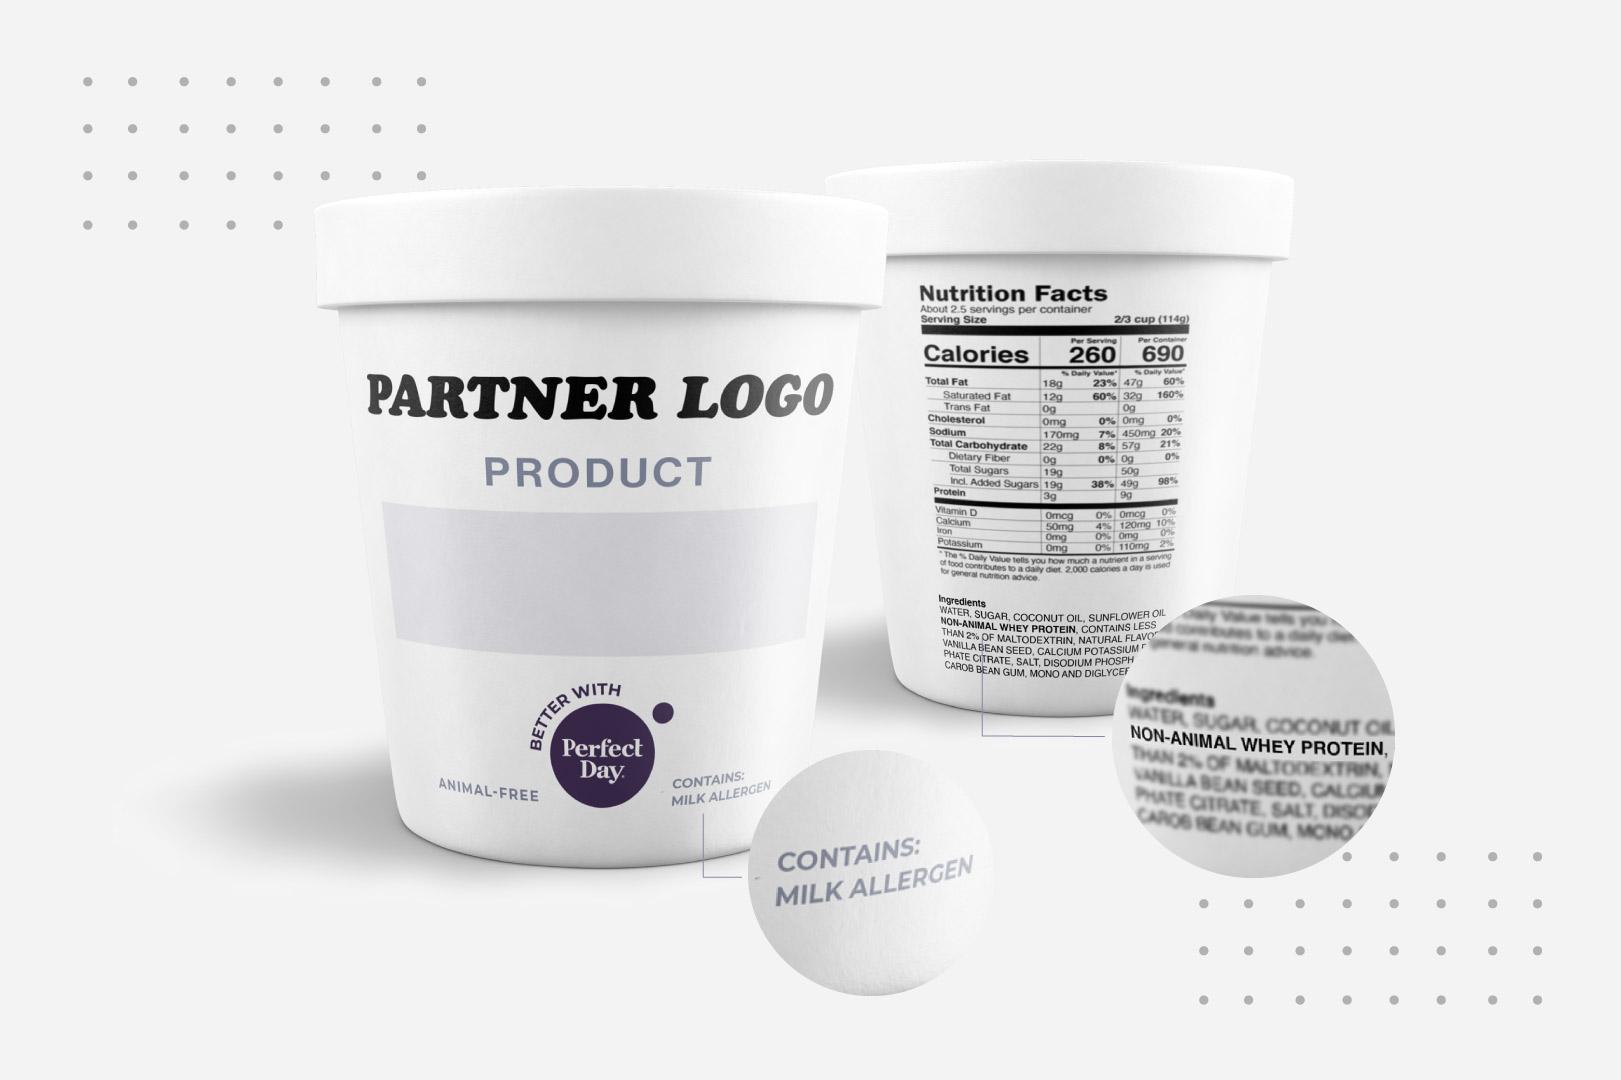 PD-Article-Milk-Allergen-Pints-1